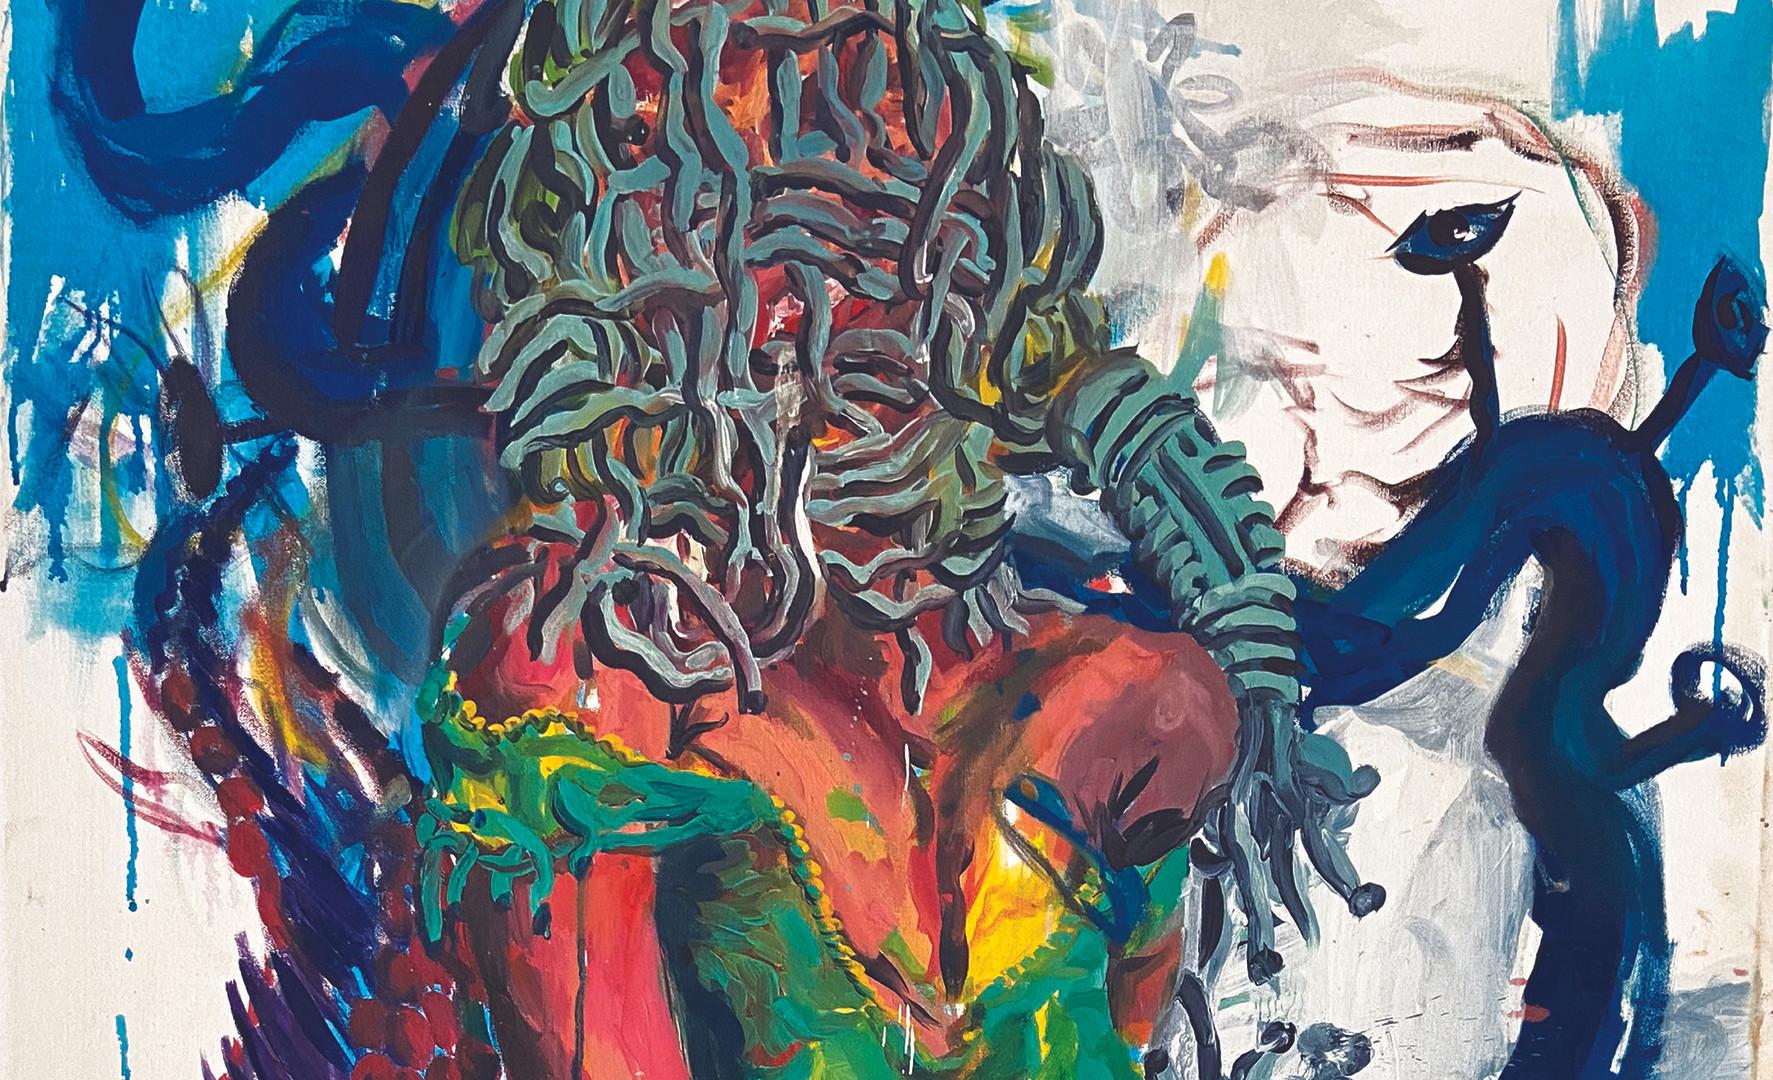 Epheas Maposa, 2020, Lady of Coa, huile sur toile, 130 x 81 cm